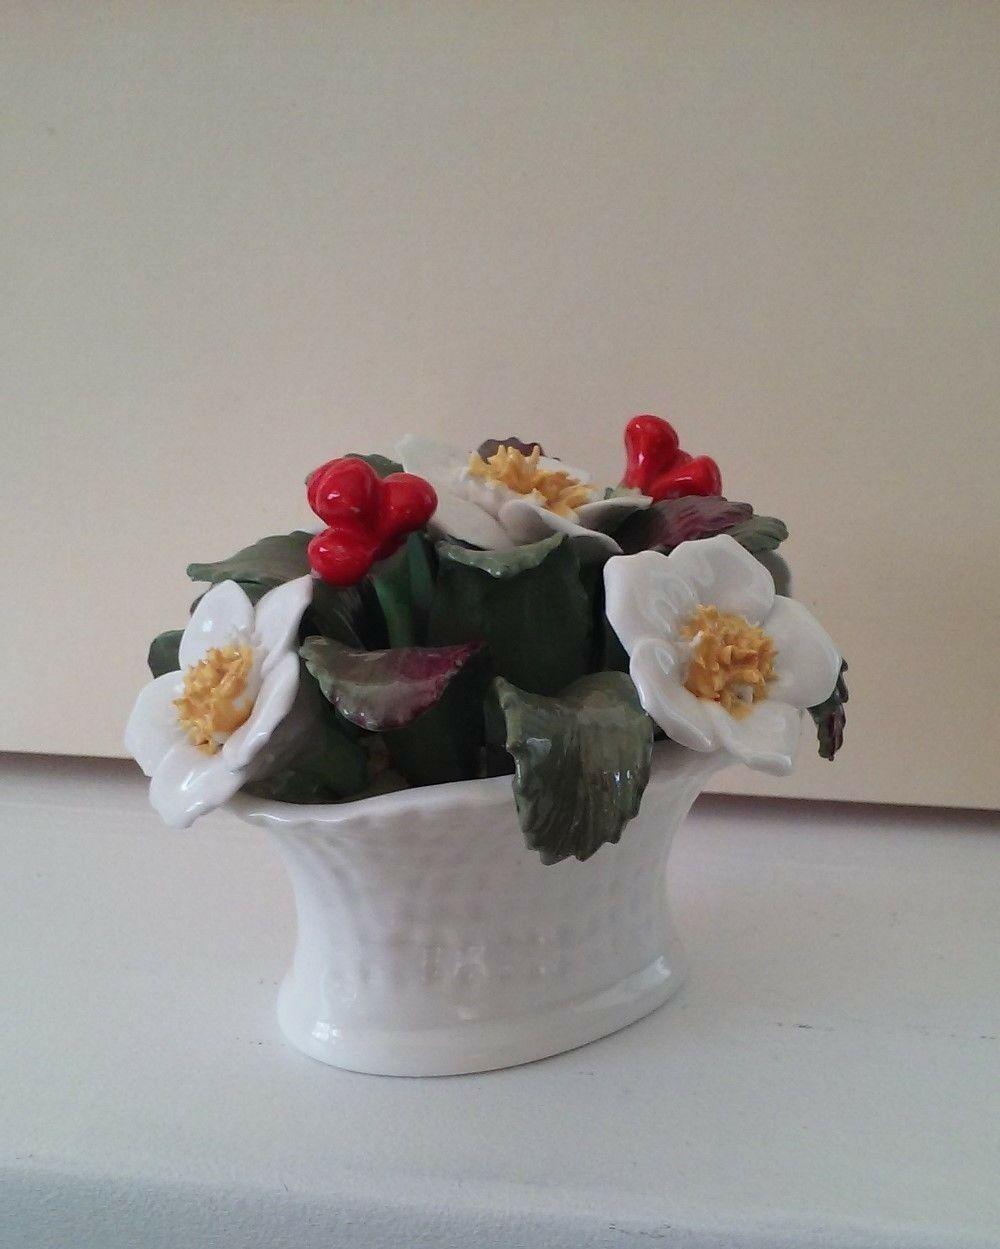 Vintage Aynsley Bone China December Christmas Rose Basket hand painted bouquet image 3